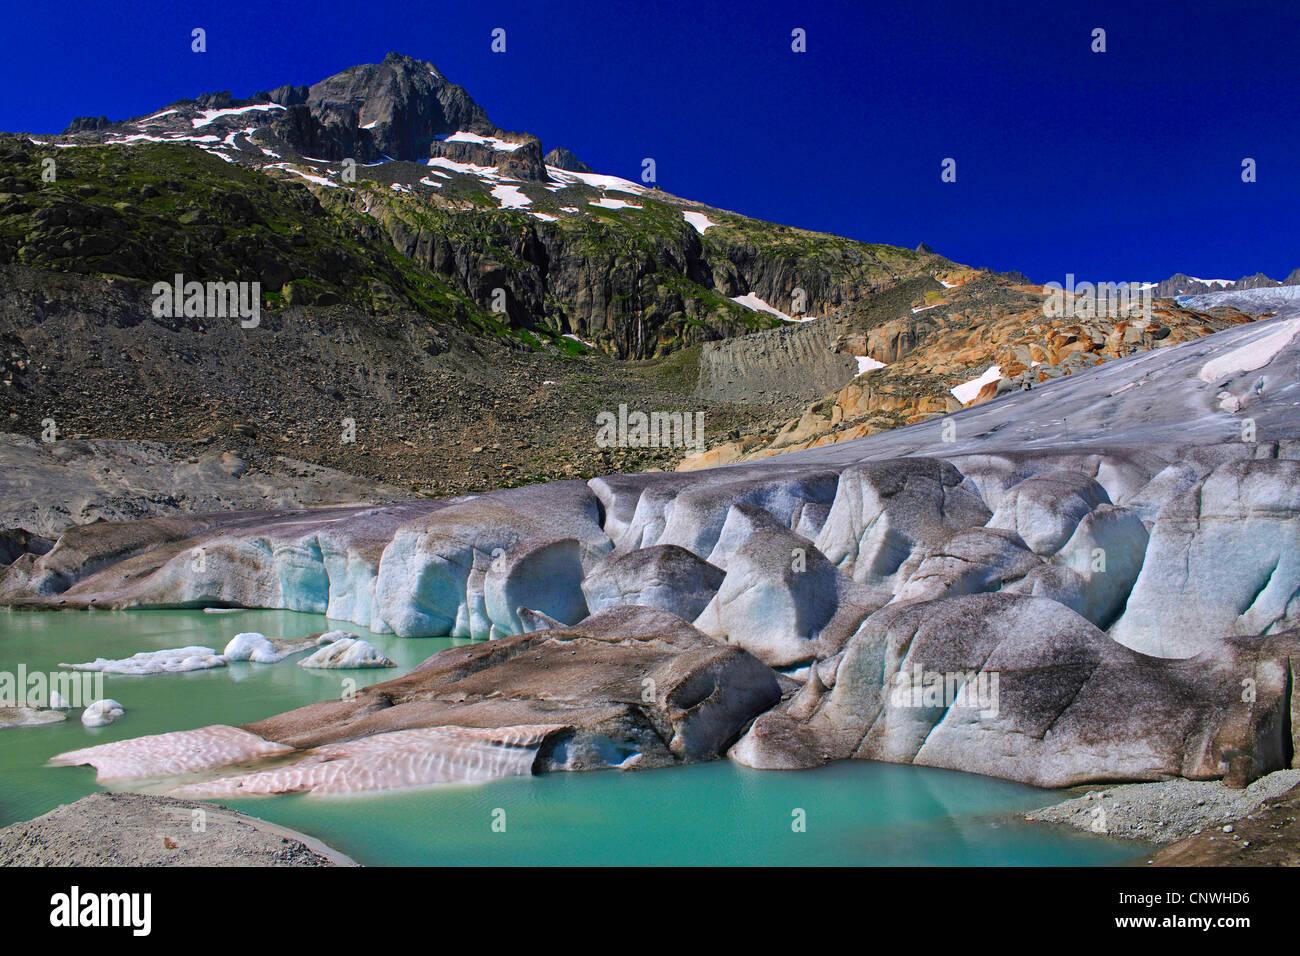 glacier lake of the Rhne Glacier, Switzerland, Valais - Stock Image